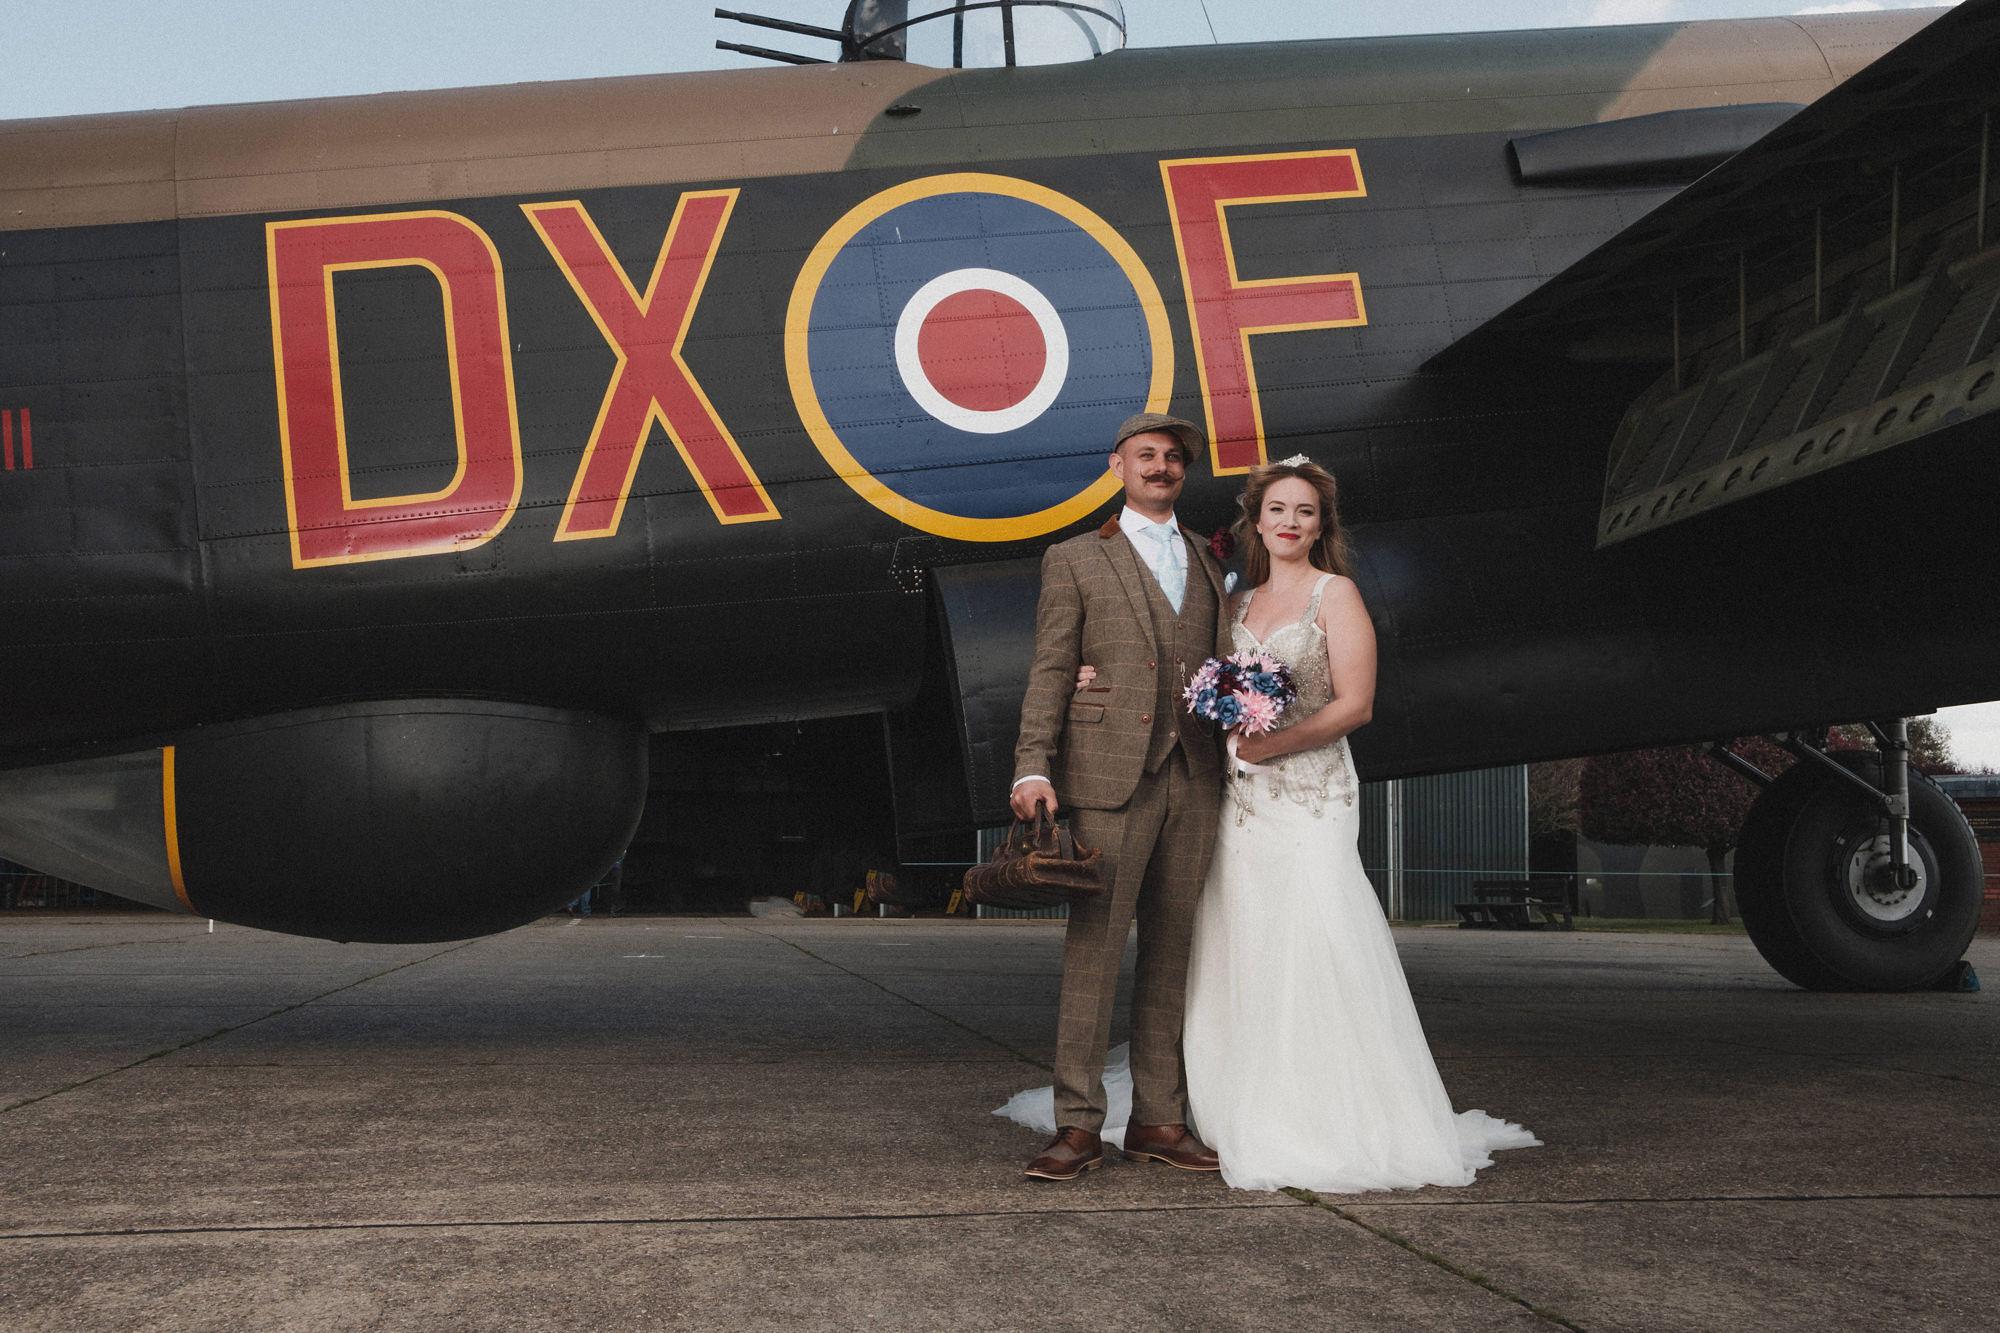 Heritage Aviation Wedding, Second and Wedding Dress, 1940s Wedding, Unconventional Wedding, Alternative Wedding, Vintage Wedding